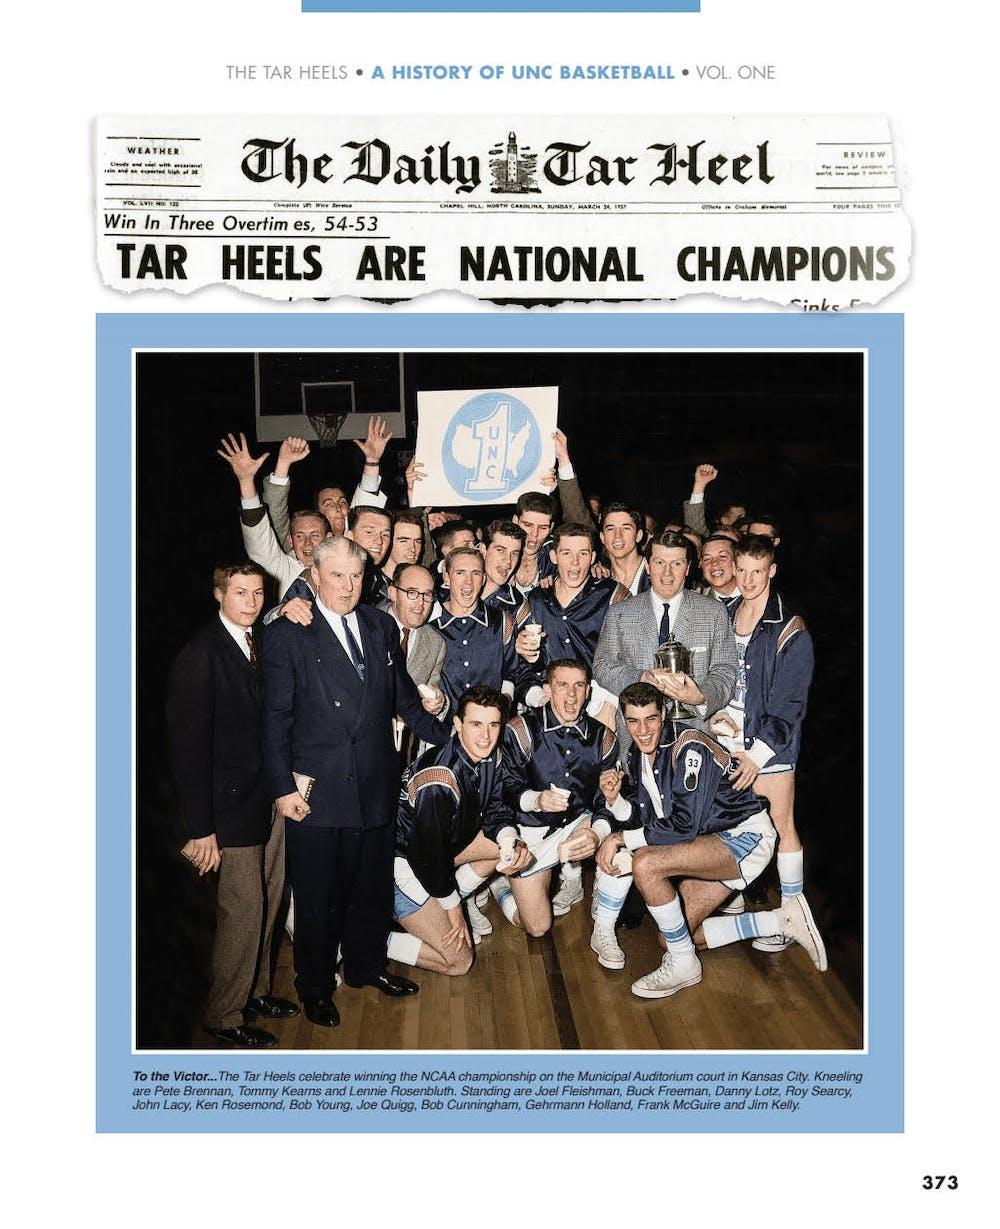 The Tar Heel Book is full of memorabilia – vintage ticket stubs, program covers, Daily Tar Heel headlines and rarely seen photos. Courtesy of The Tar Heel Book authors.